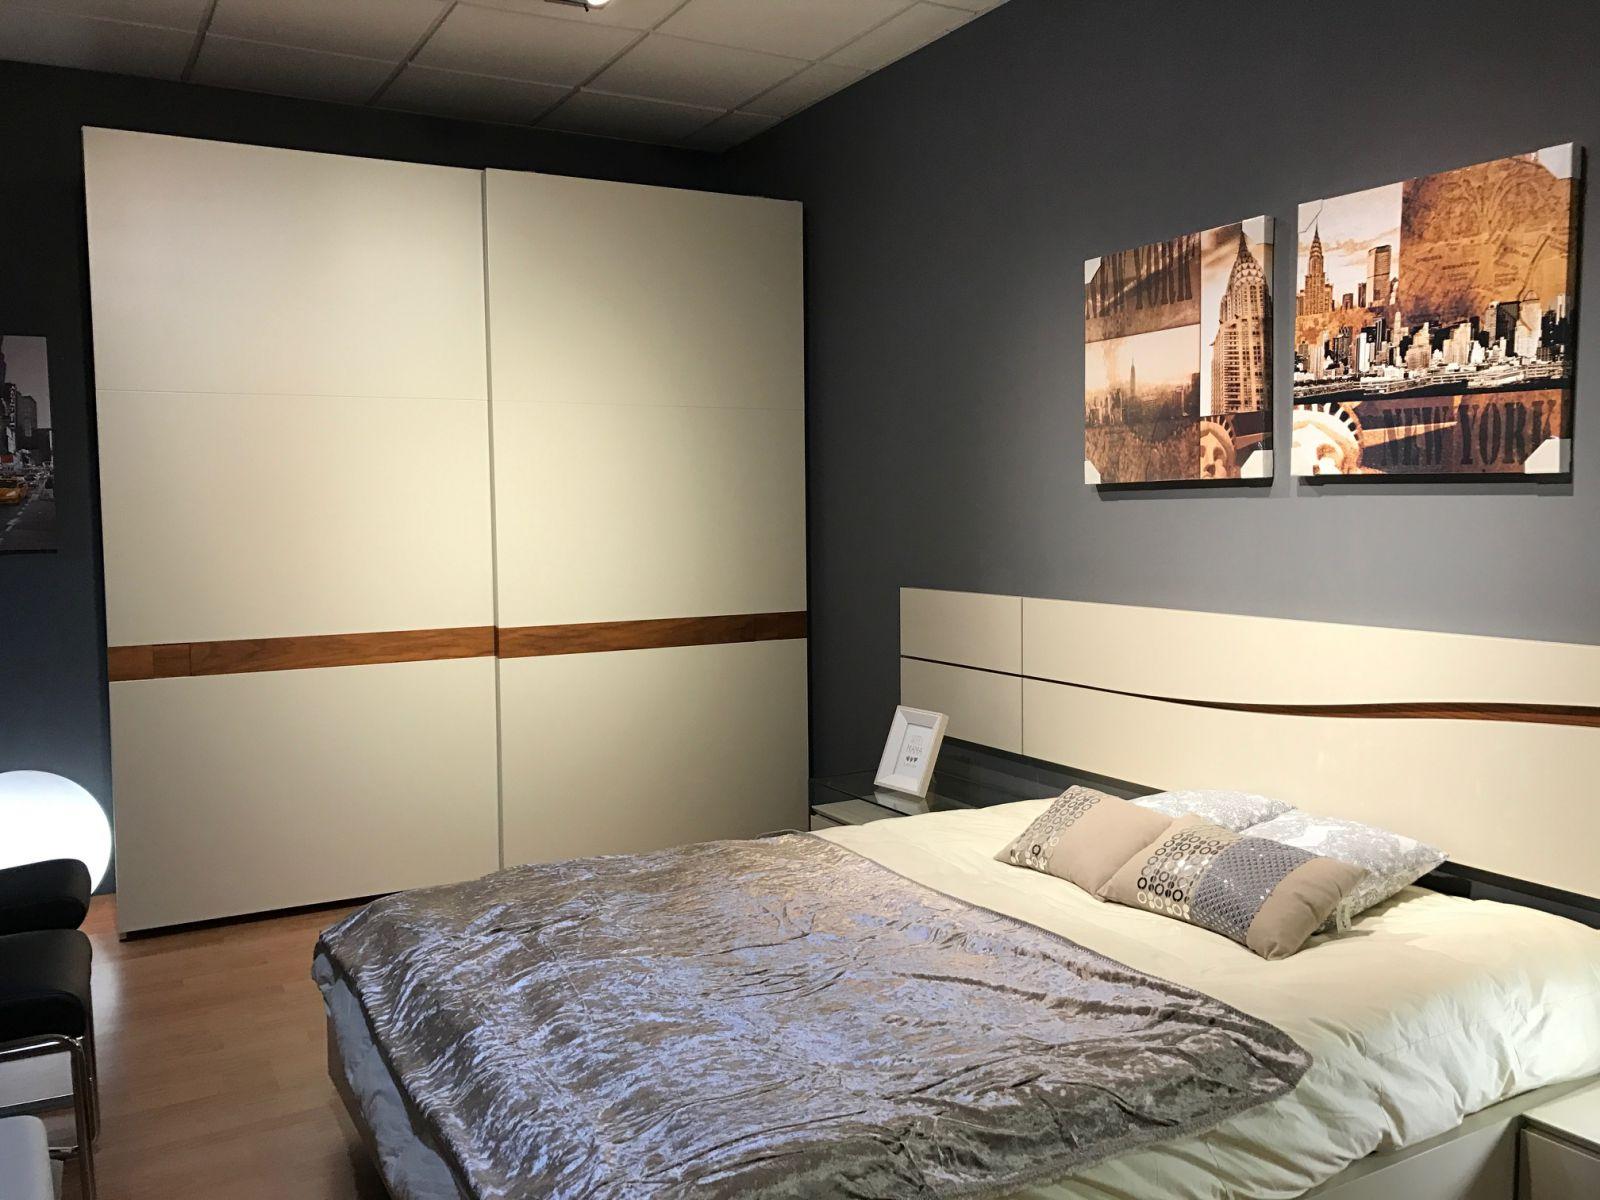 Dormitorio matrimonio armario laca blanca for Estantes dormitorio matrimonio